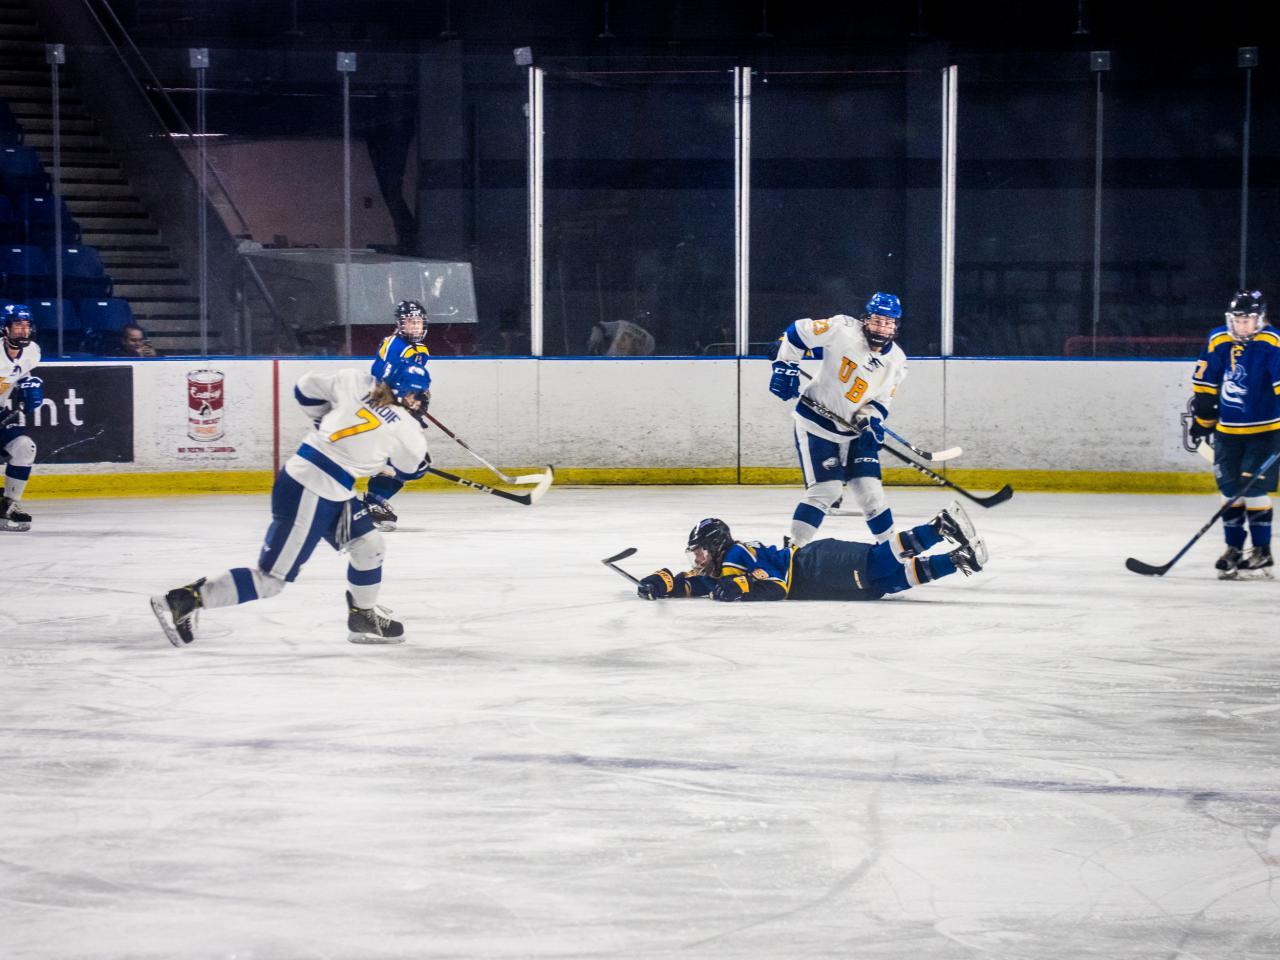 Ice-Hockey-the-ubyssey-Saman-Shariati-17.jpg